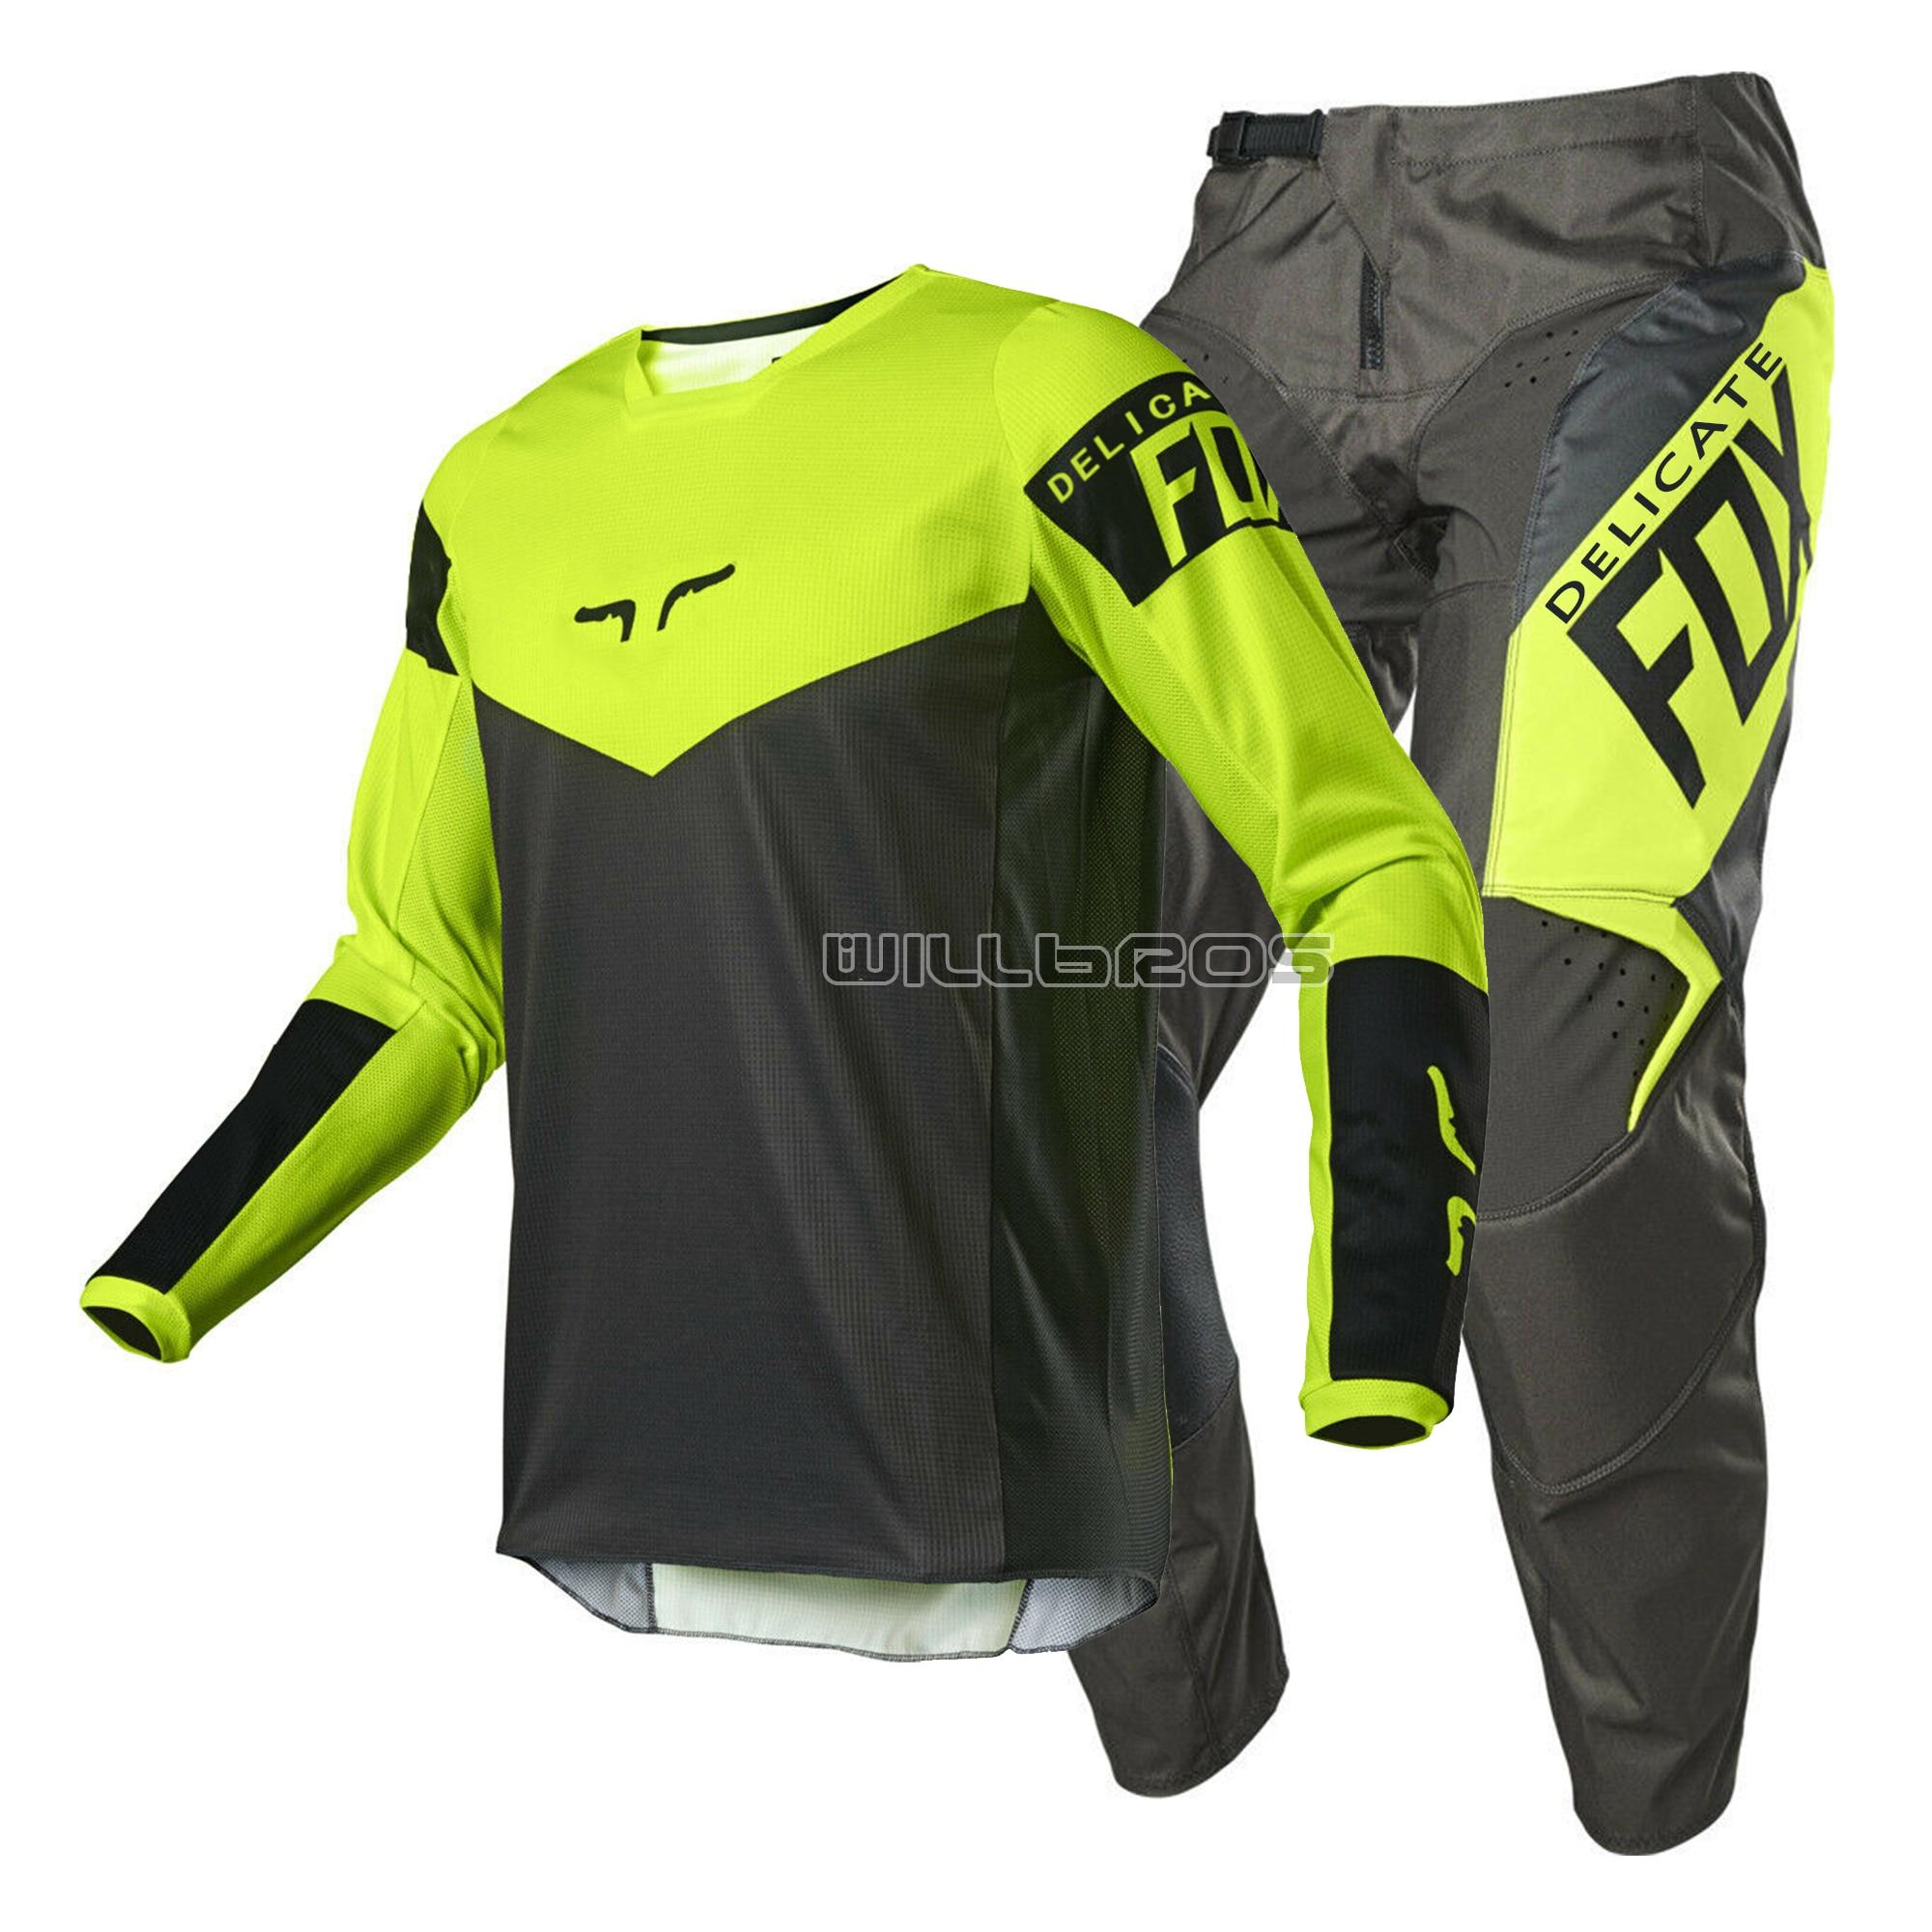 2021 raposa delicada 180 revn motocross moto mountain bike offroad equitação offroad terno dos homens kit